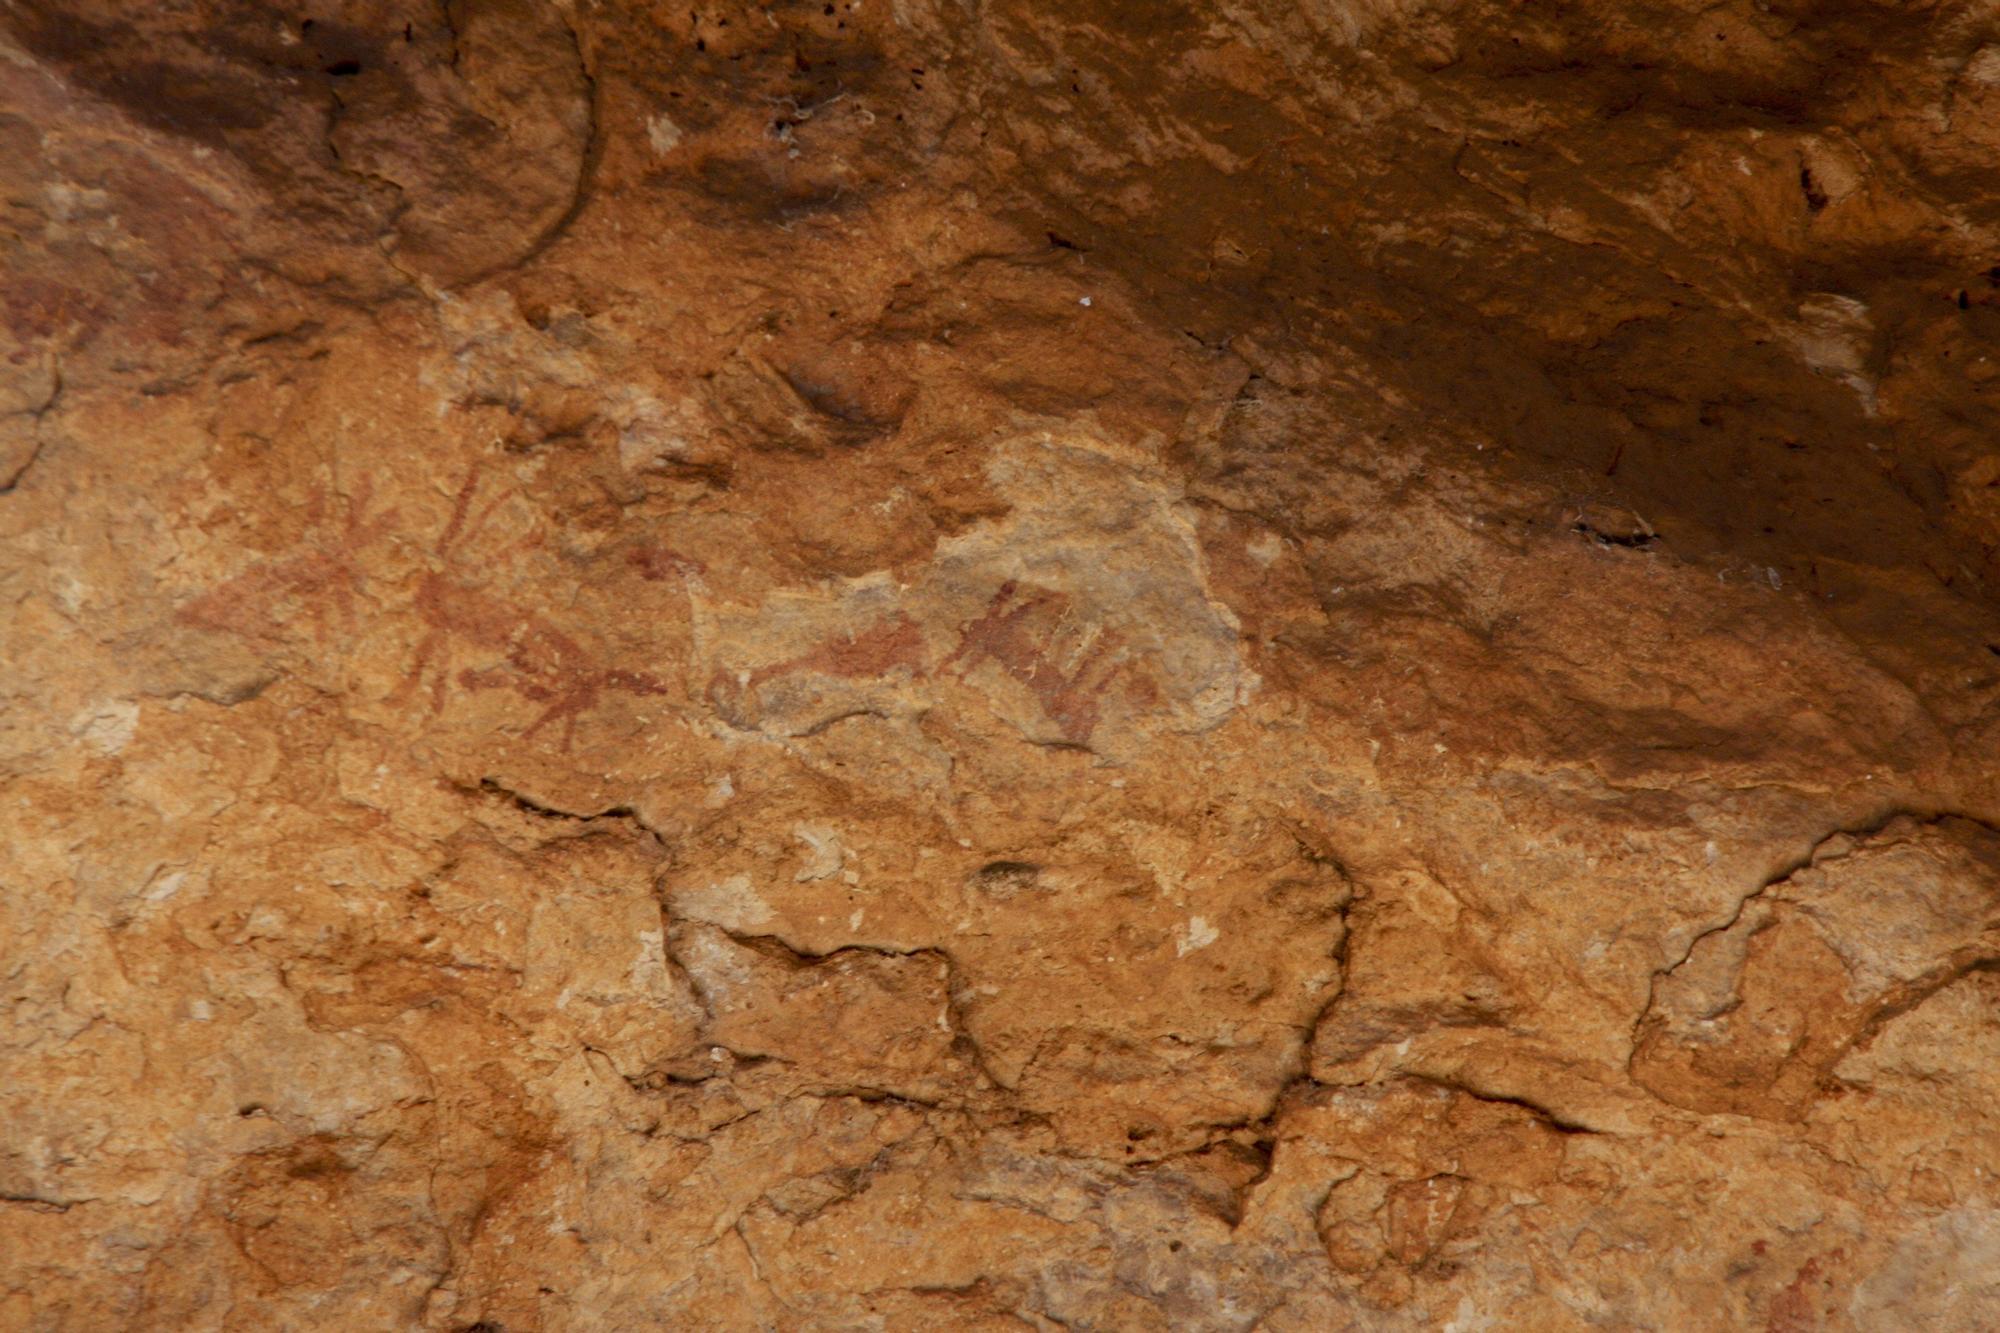 Bicorp pinturas rupestres 003.JPG